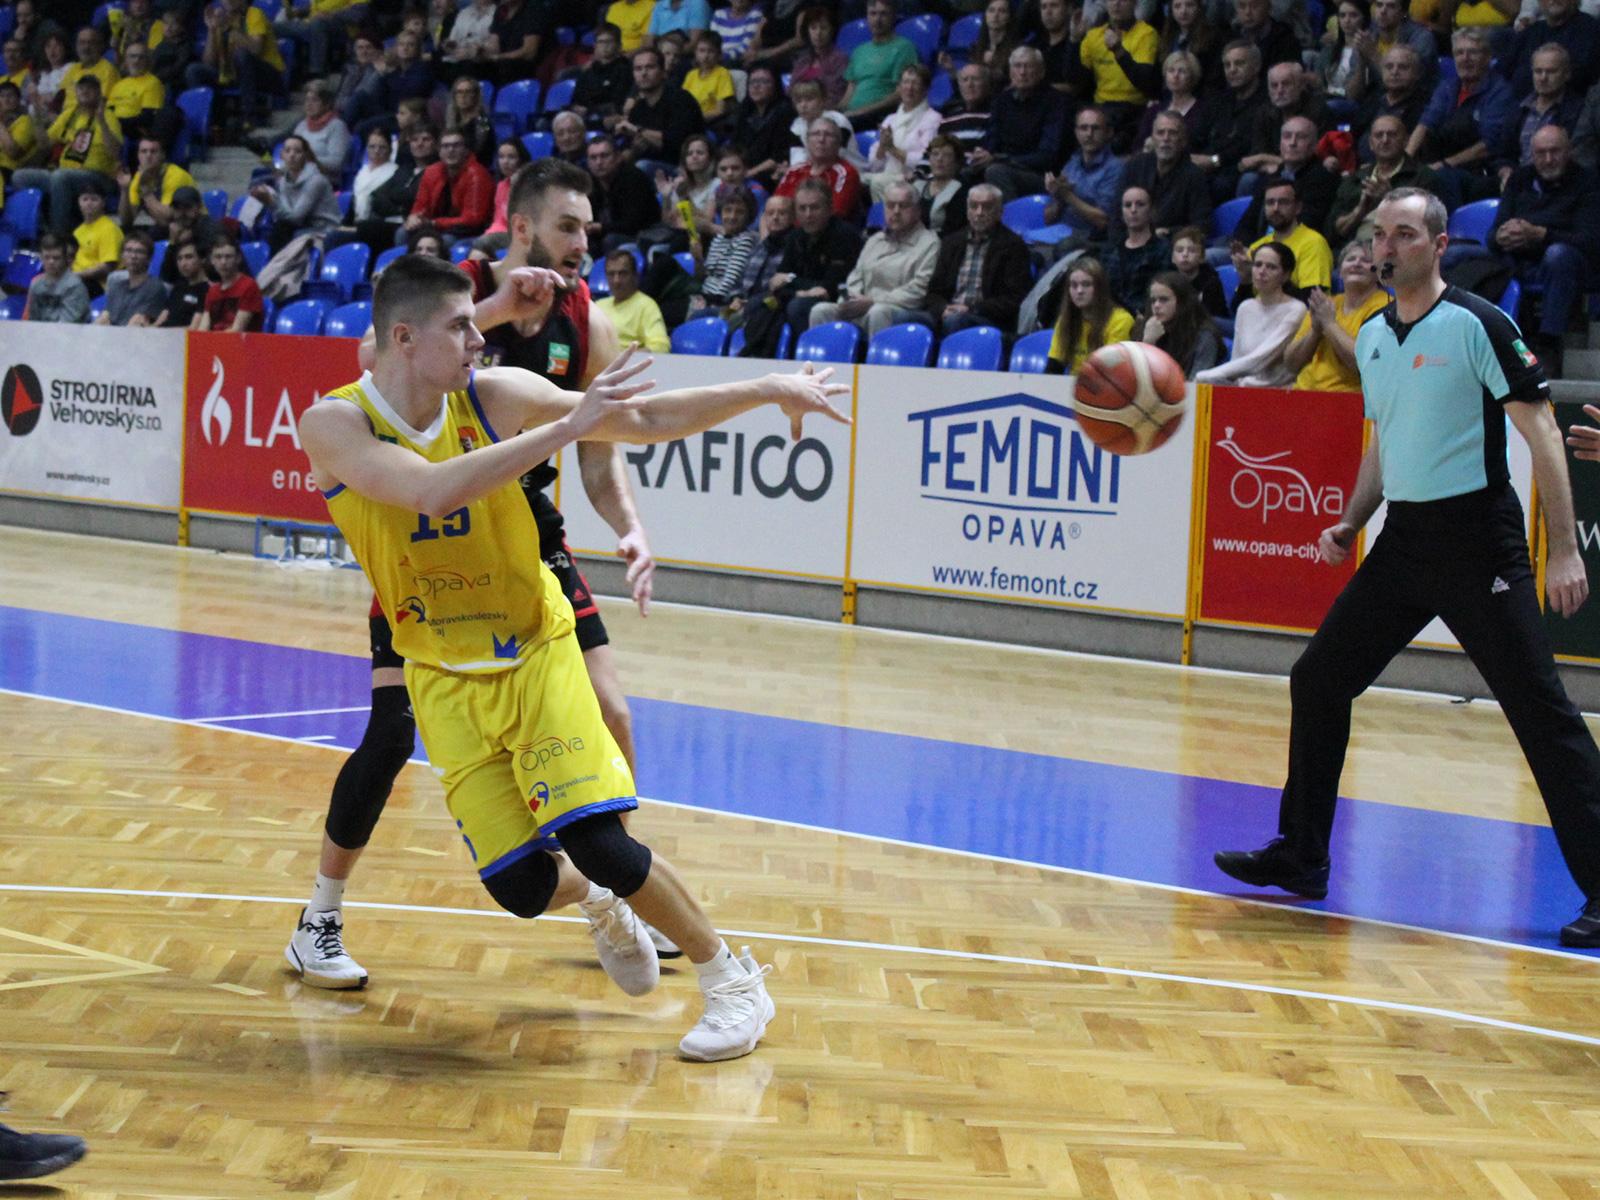 USK má teď nejlepší formu v lize, varuje Václav Bujnoch